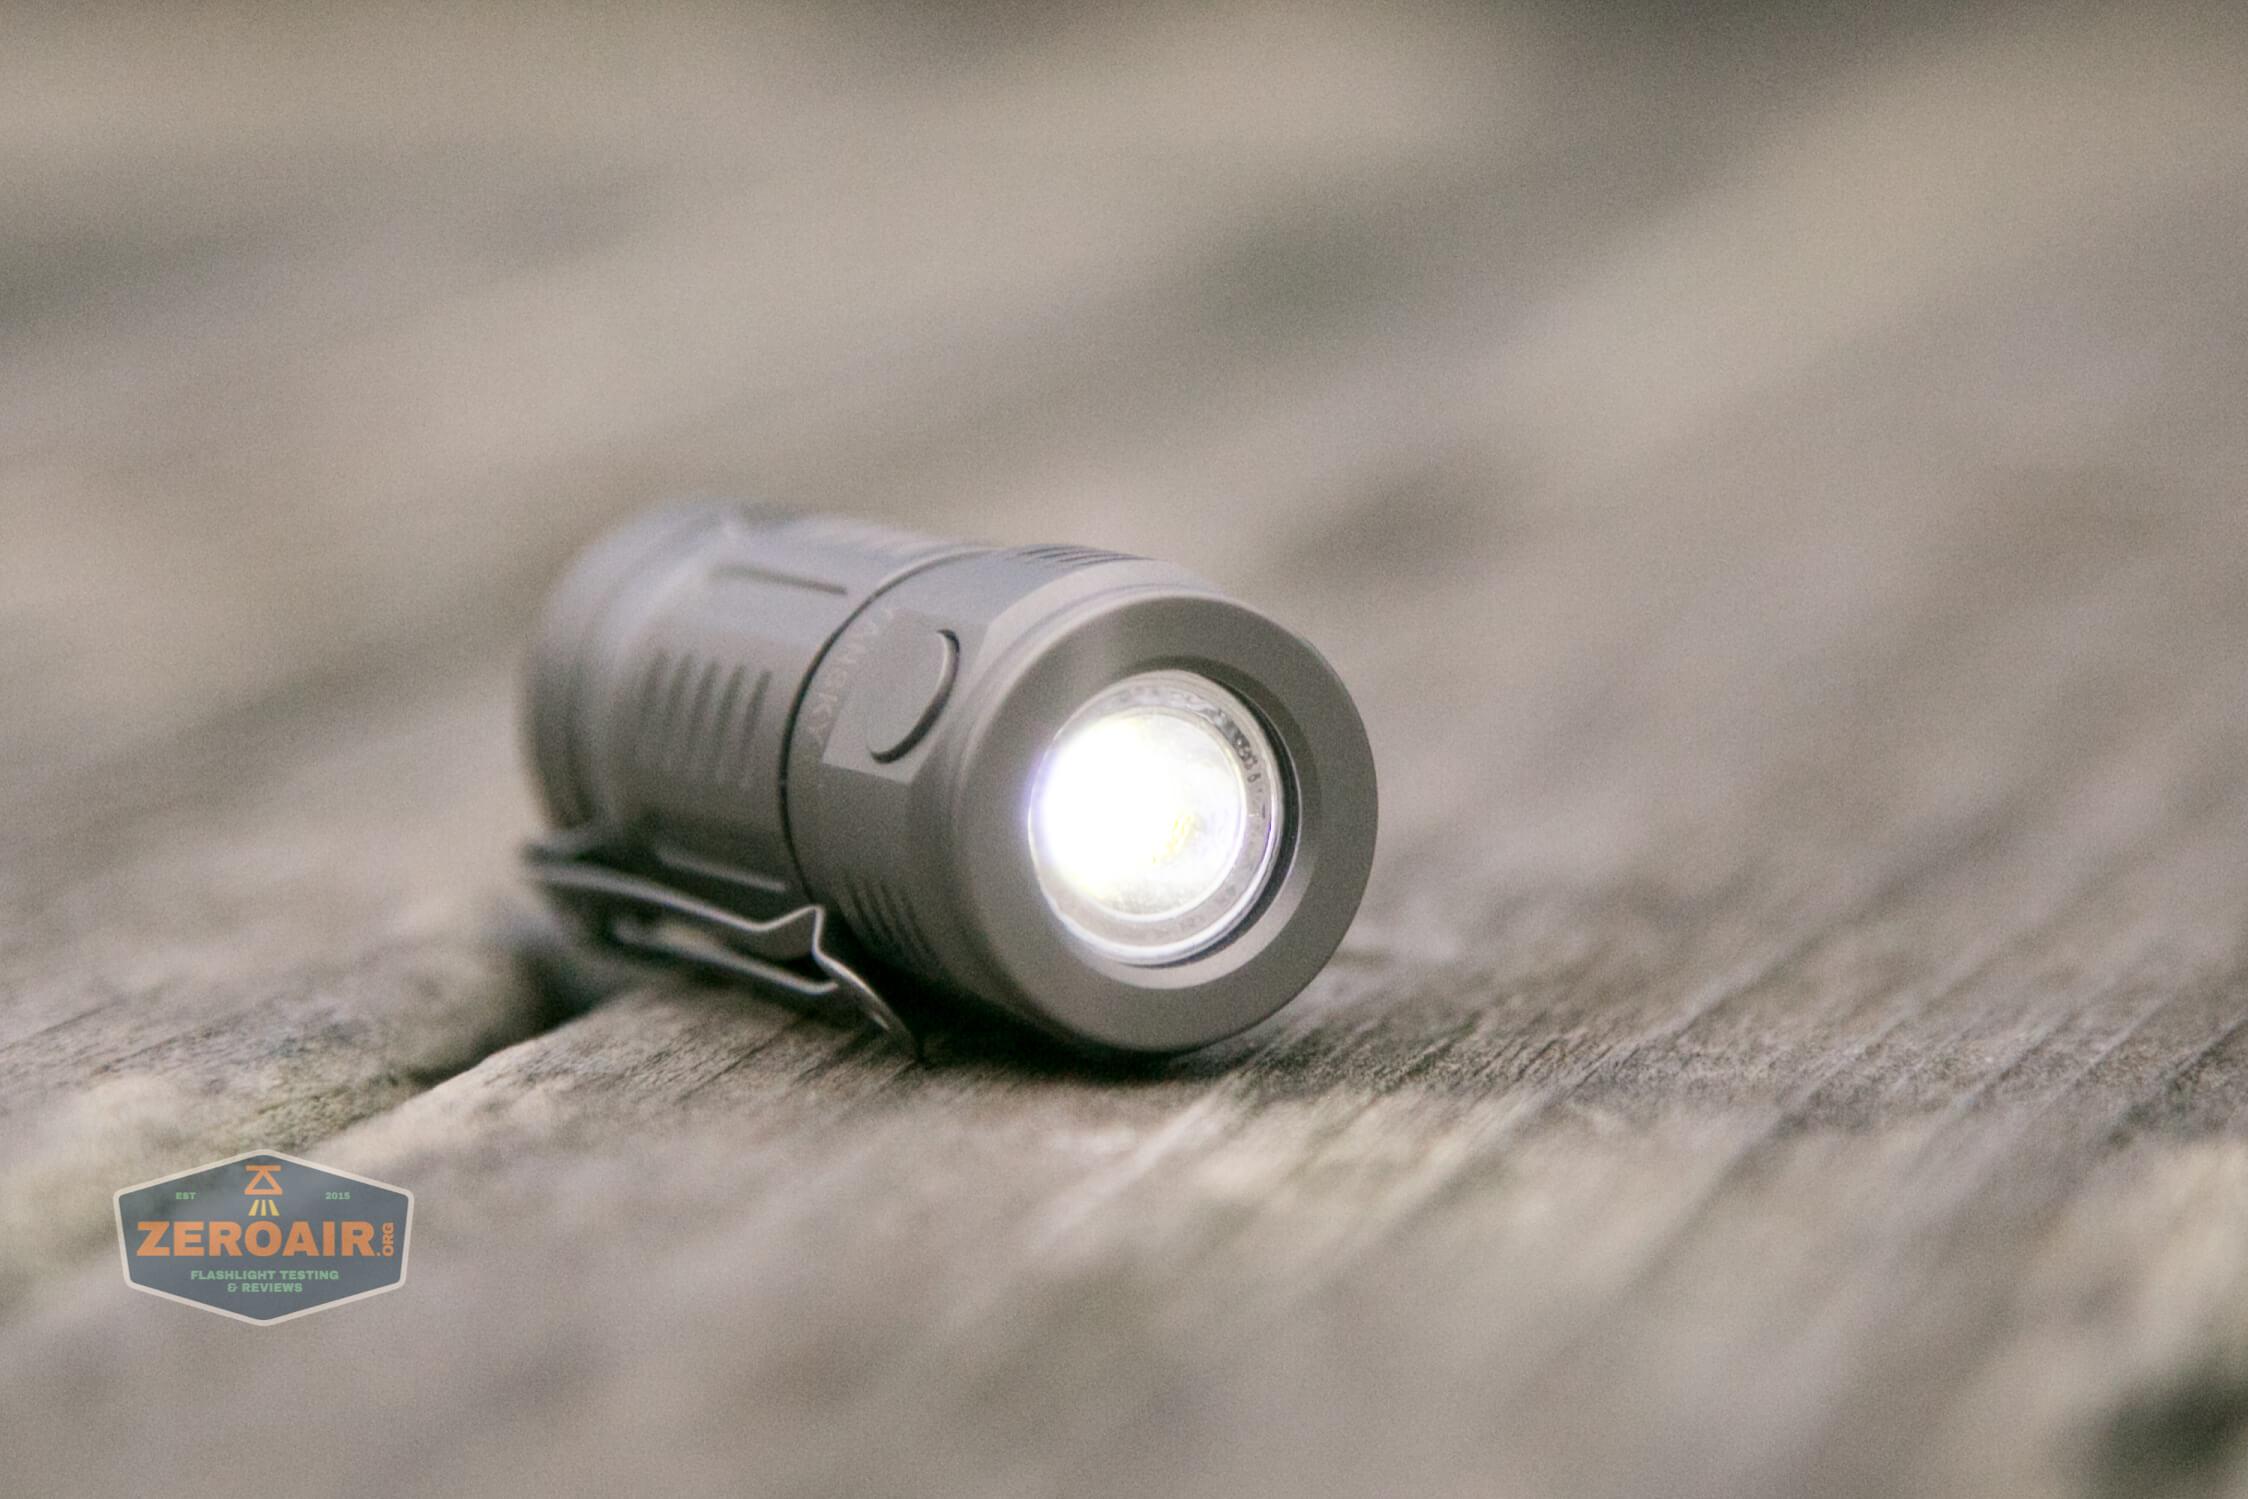 freasygears cyansky m3 titanium pocket flashlight on low